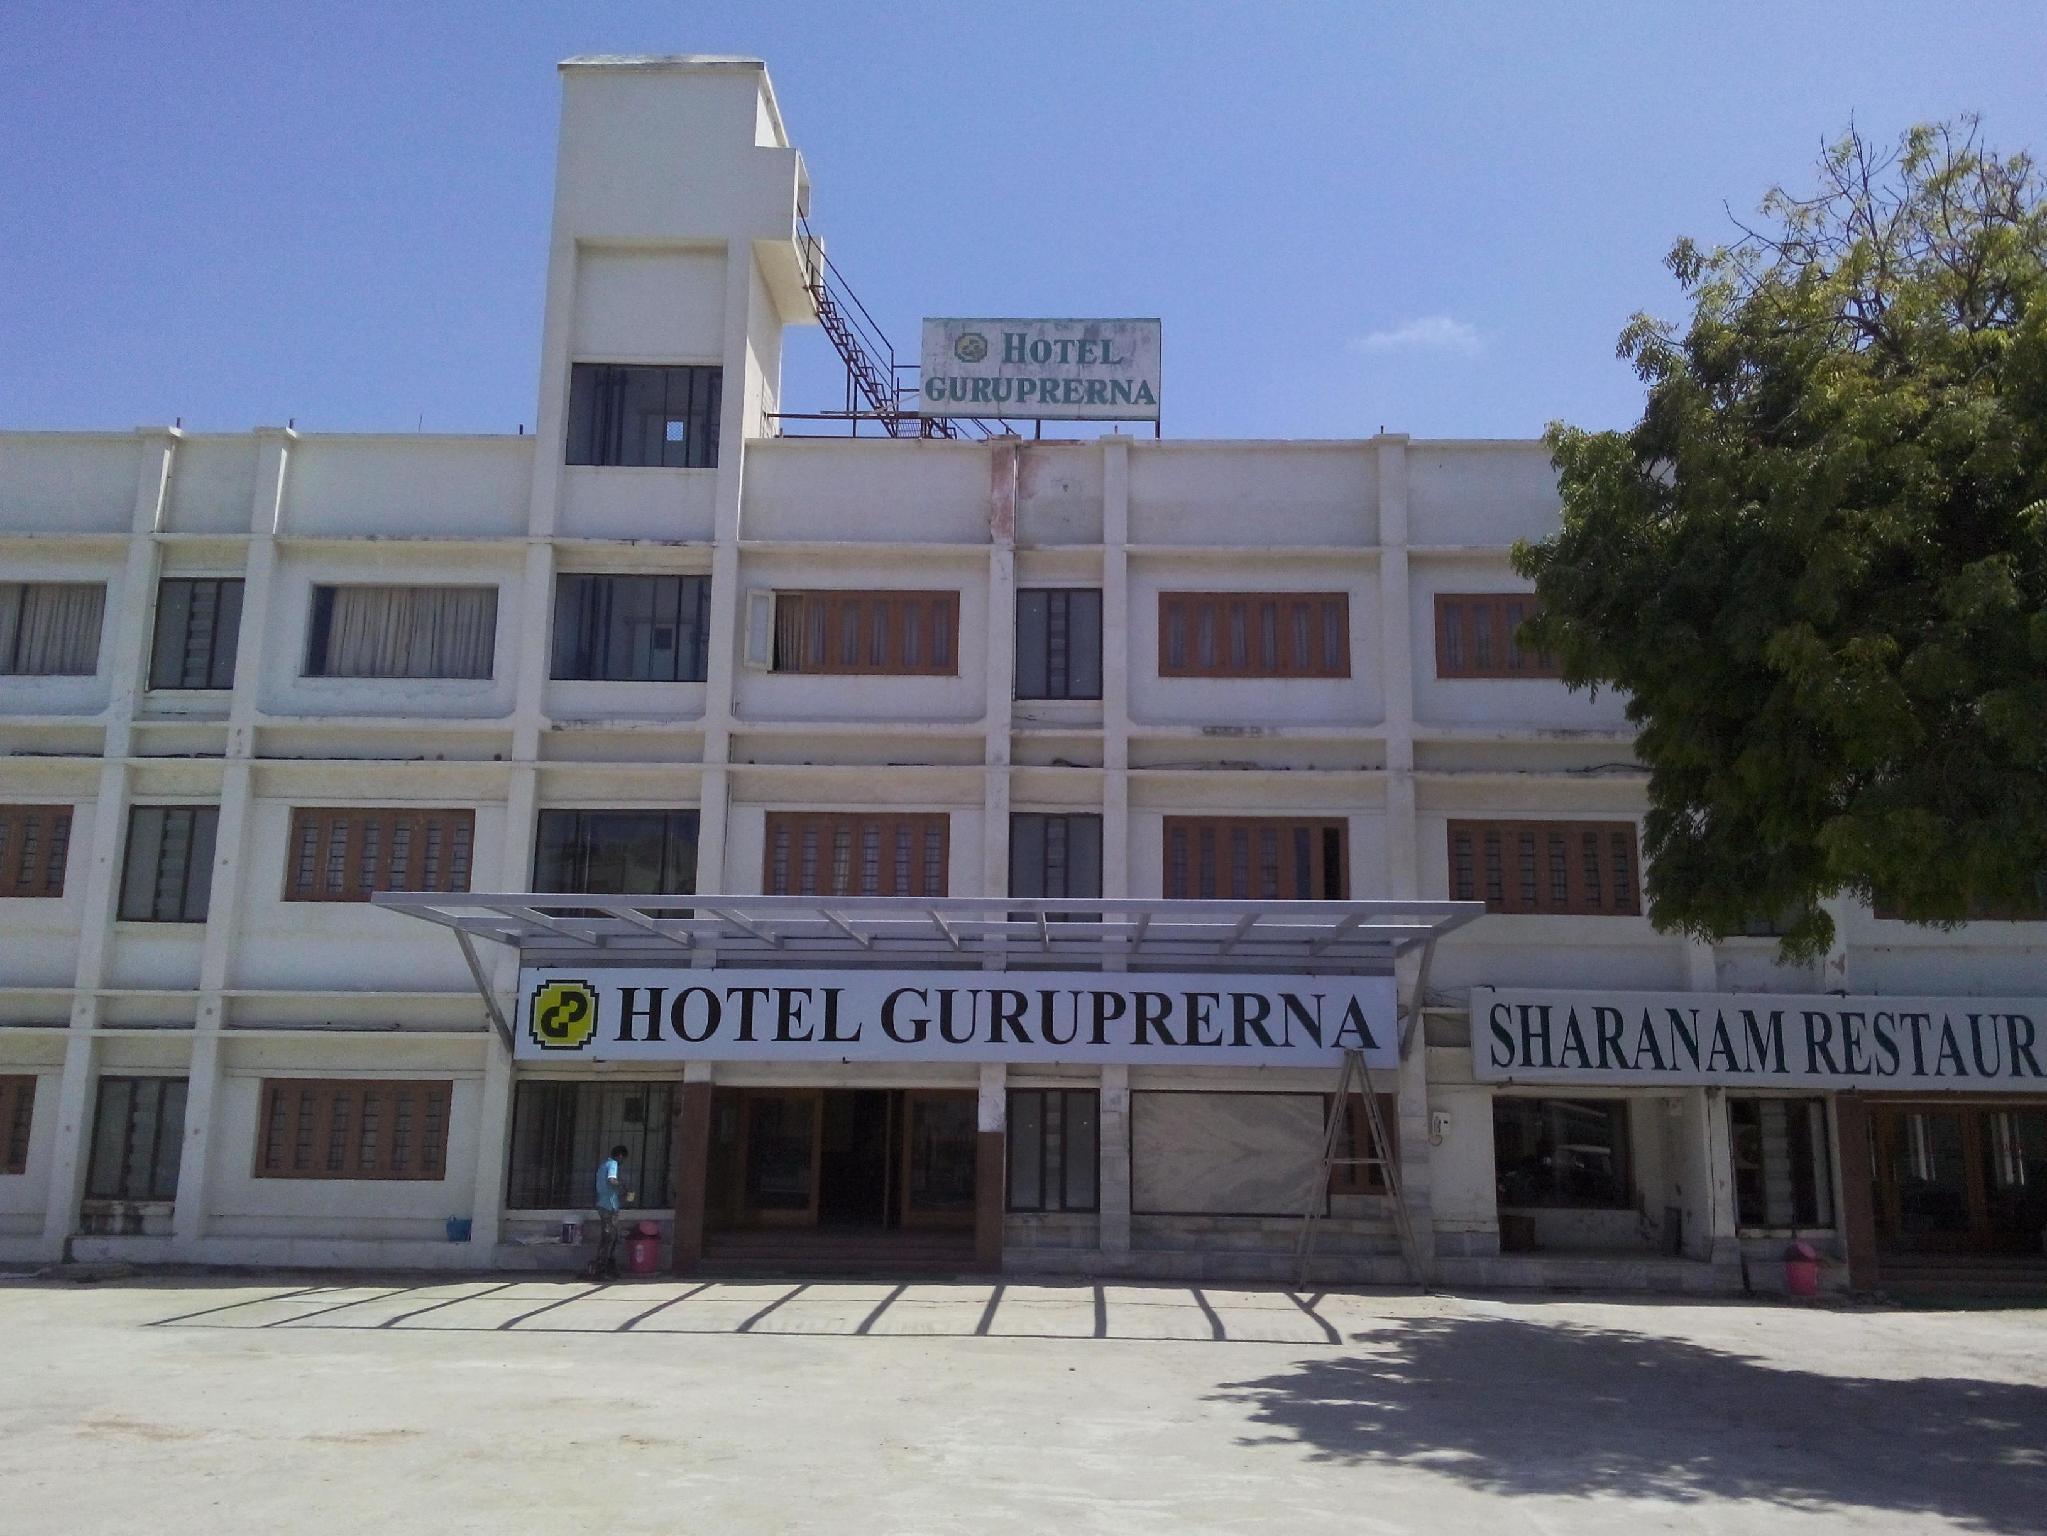 Hotel Guruprerna Dwarka, Devbhumi Dwarka